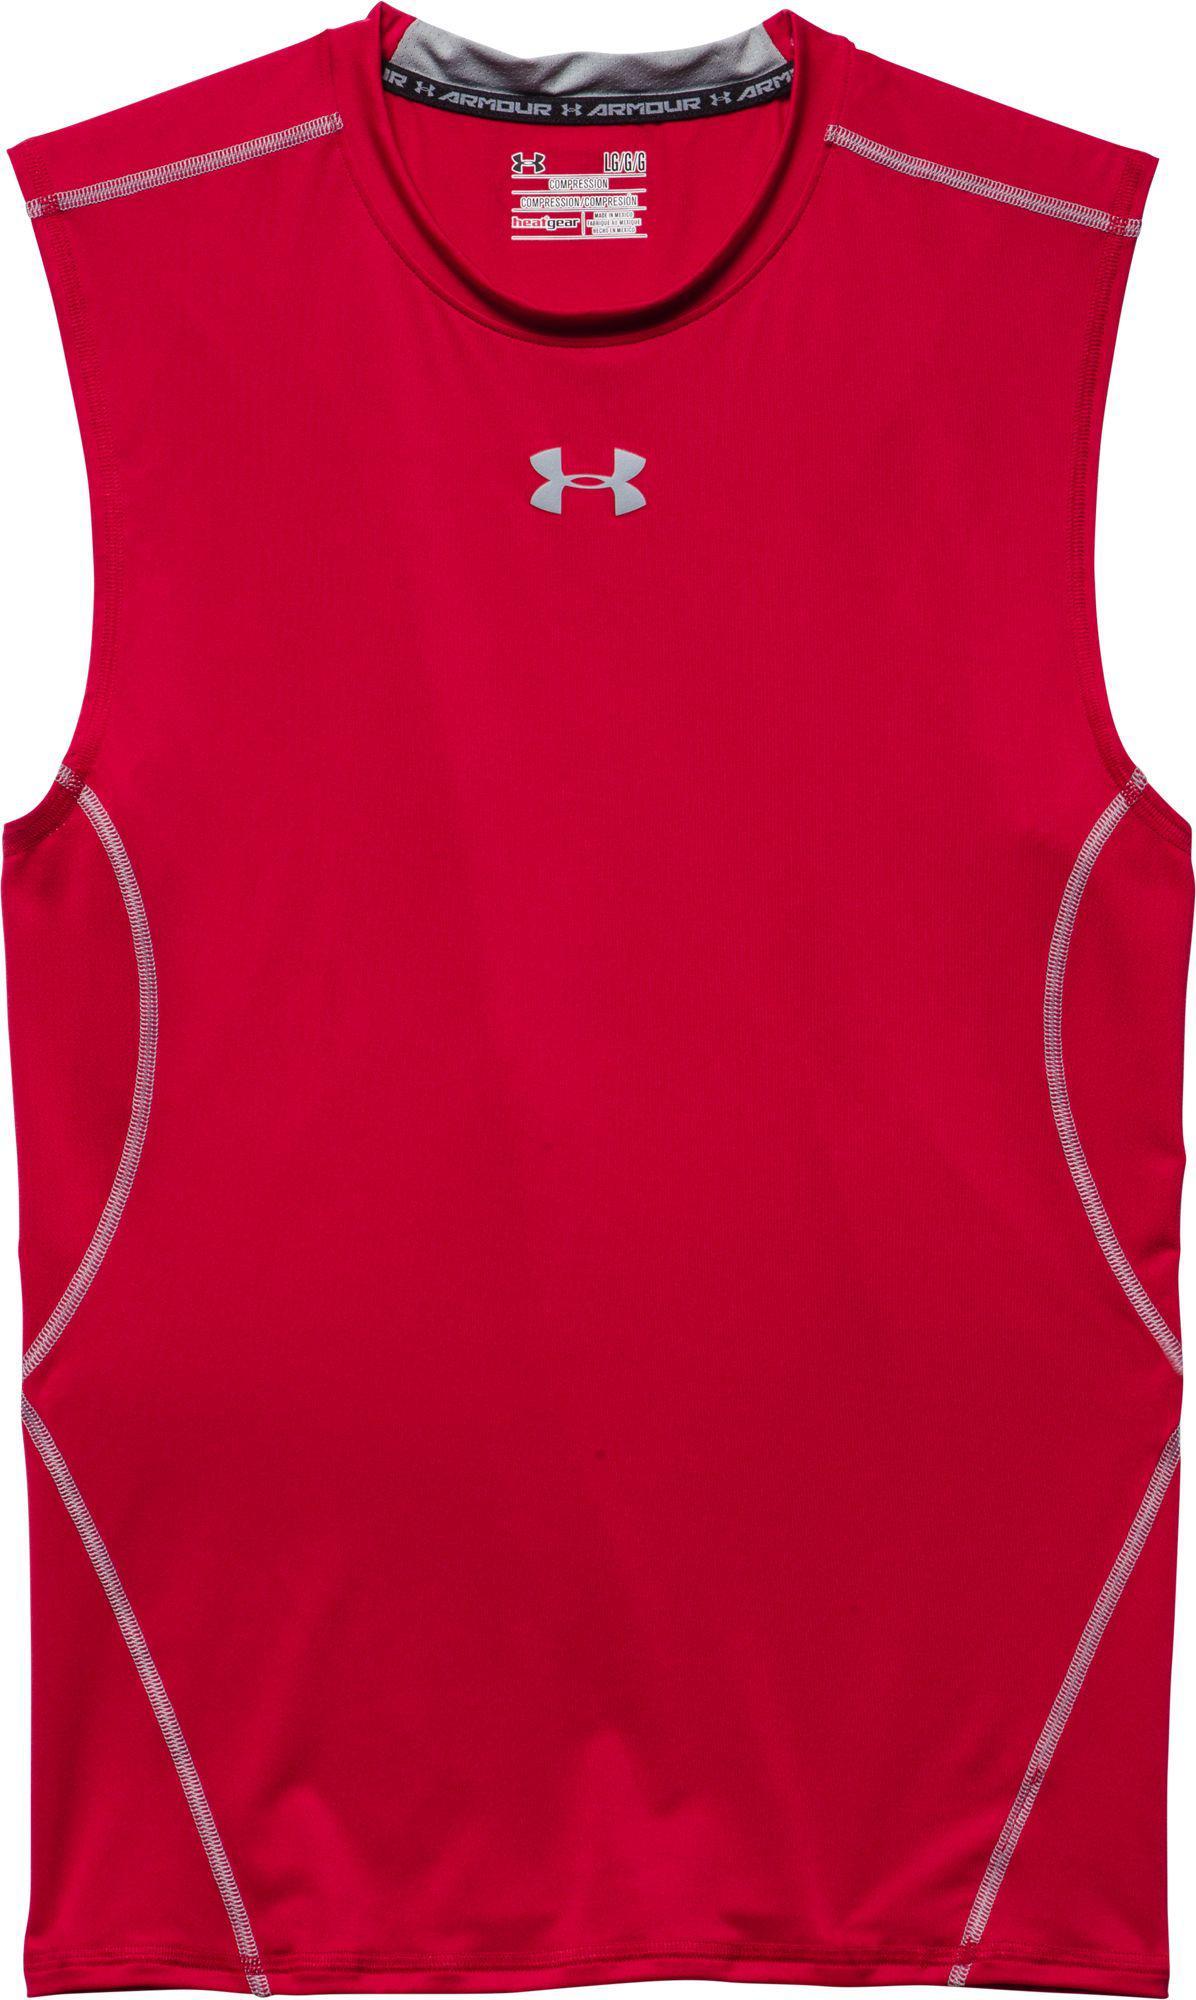 32b4c44d Lyst - Under Armour Heatgear Armour Sleeveless Shirt in Red for Men